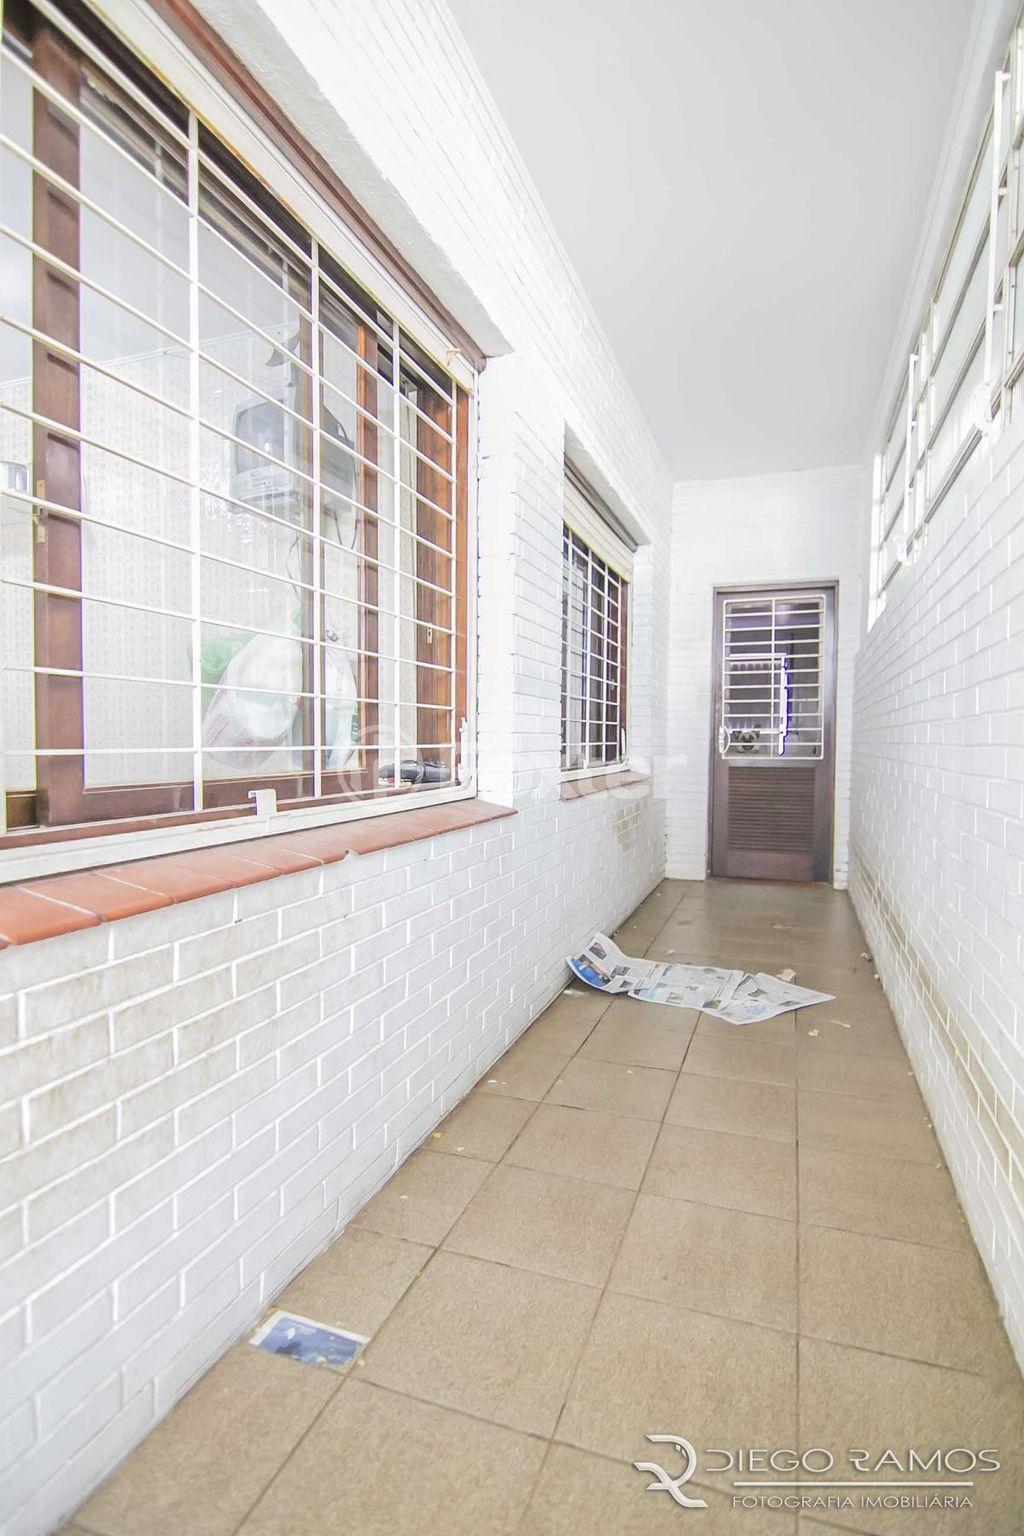 Casa 4 Dorm, Jardim Itu Sabará, Porto Alegre (139526) - Foto 14